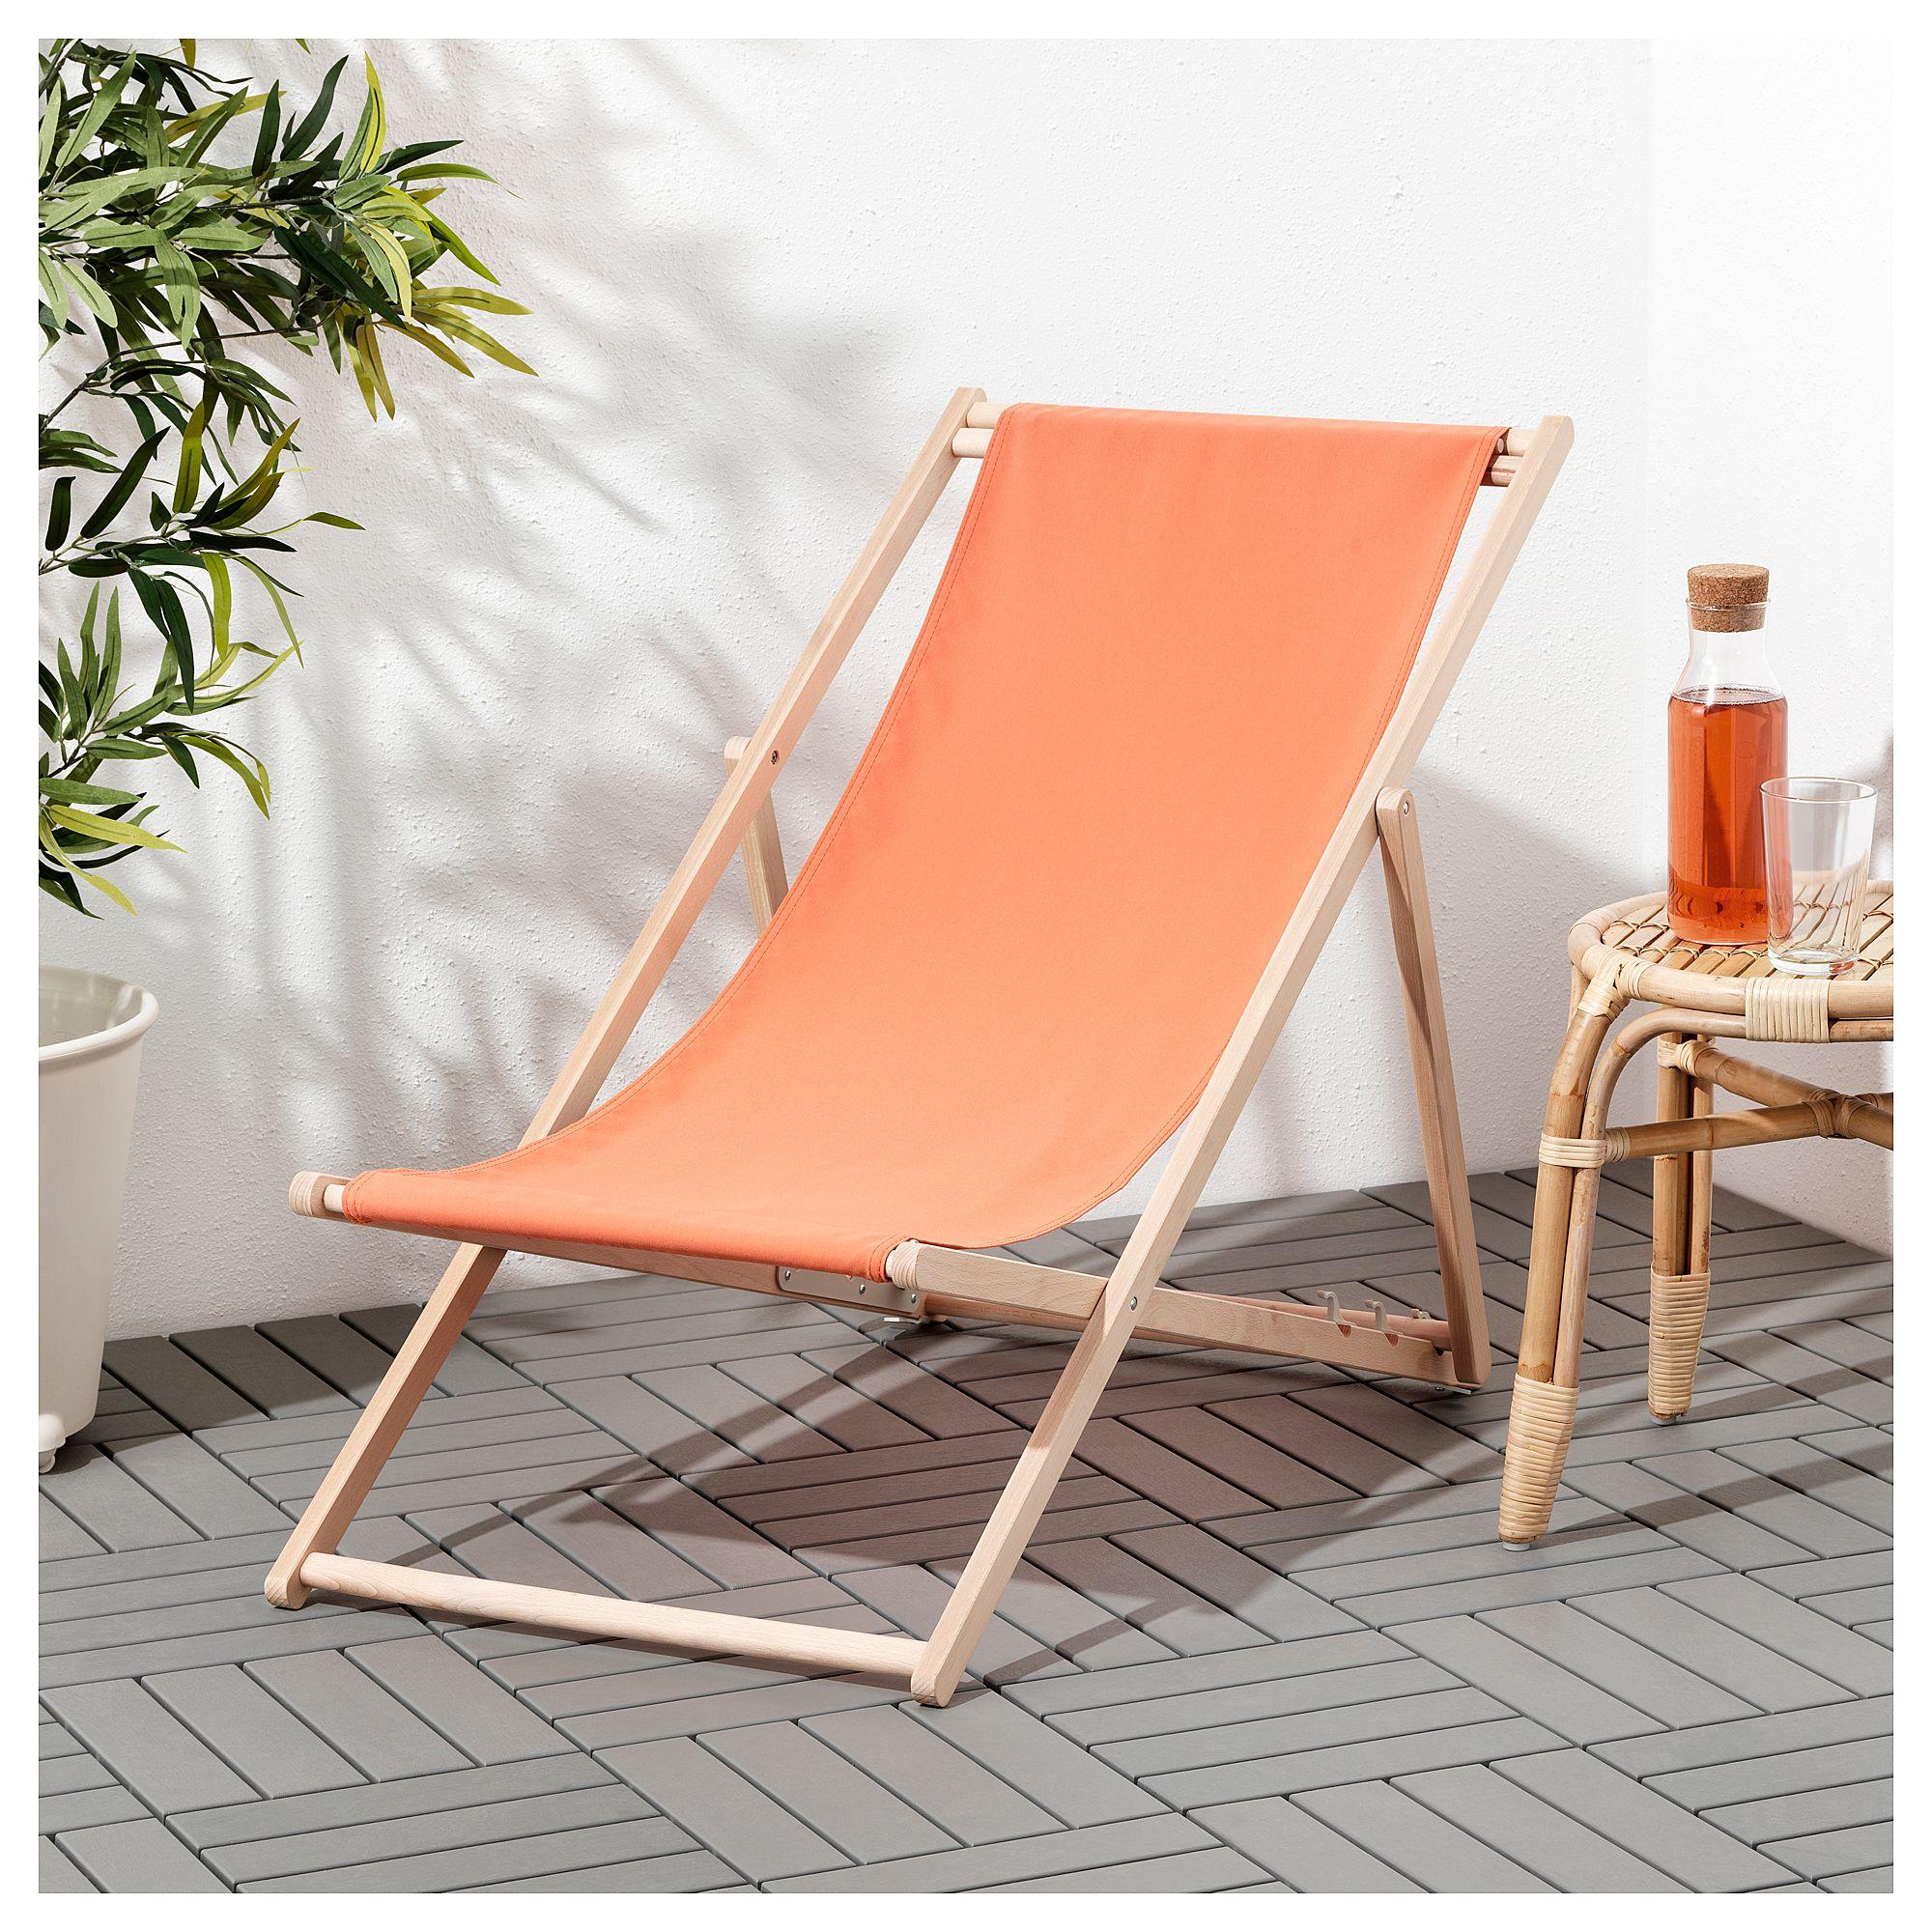 Furniture and home furnishings beach chairs balcony